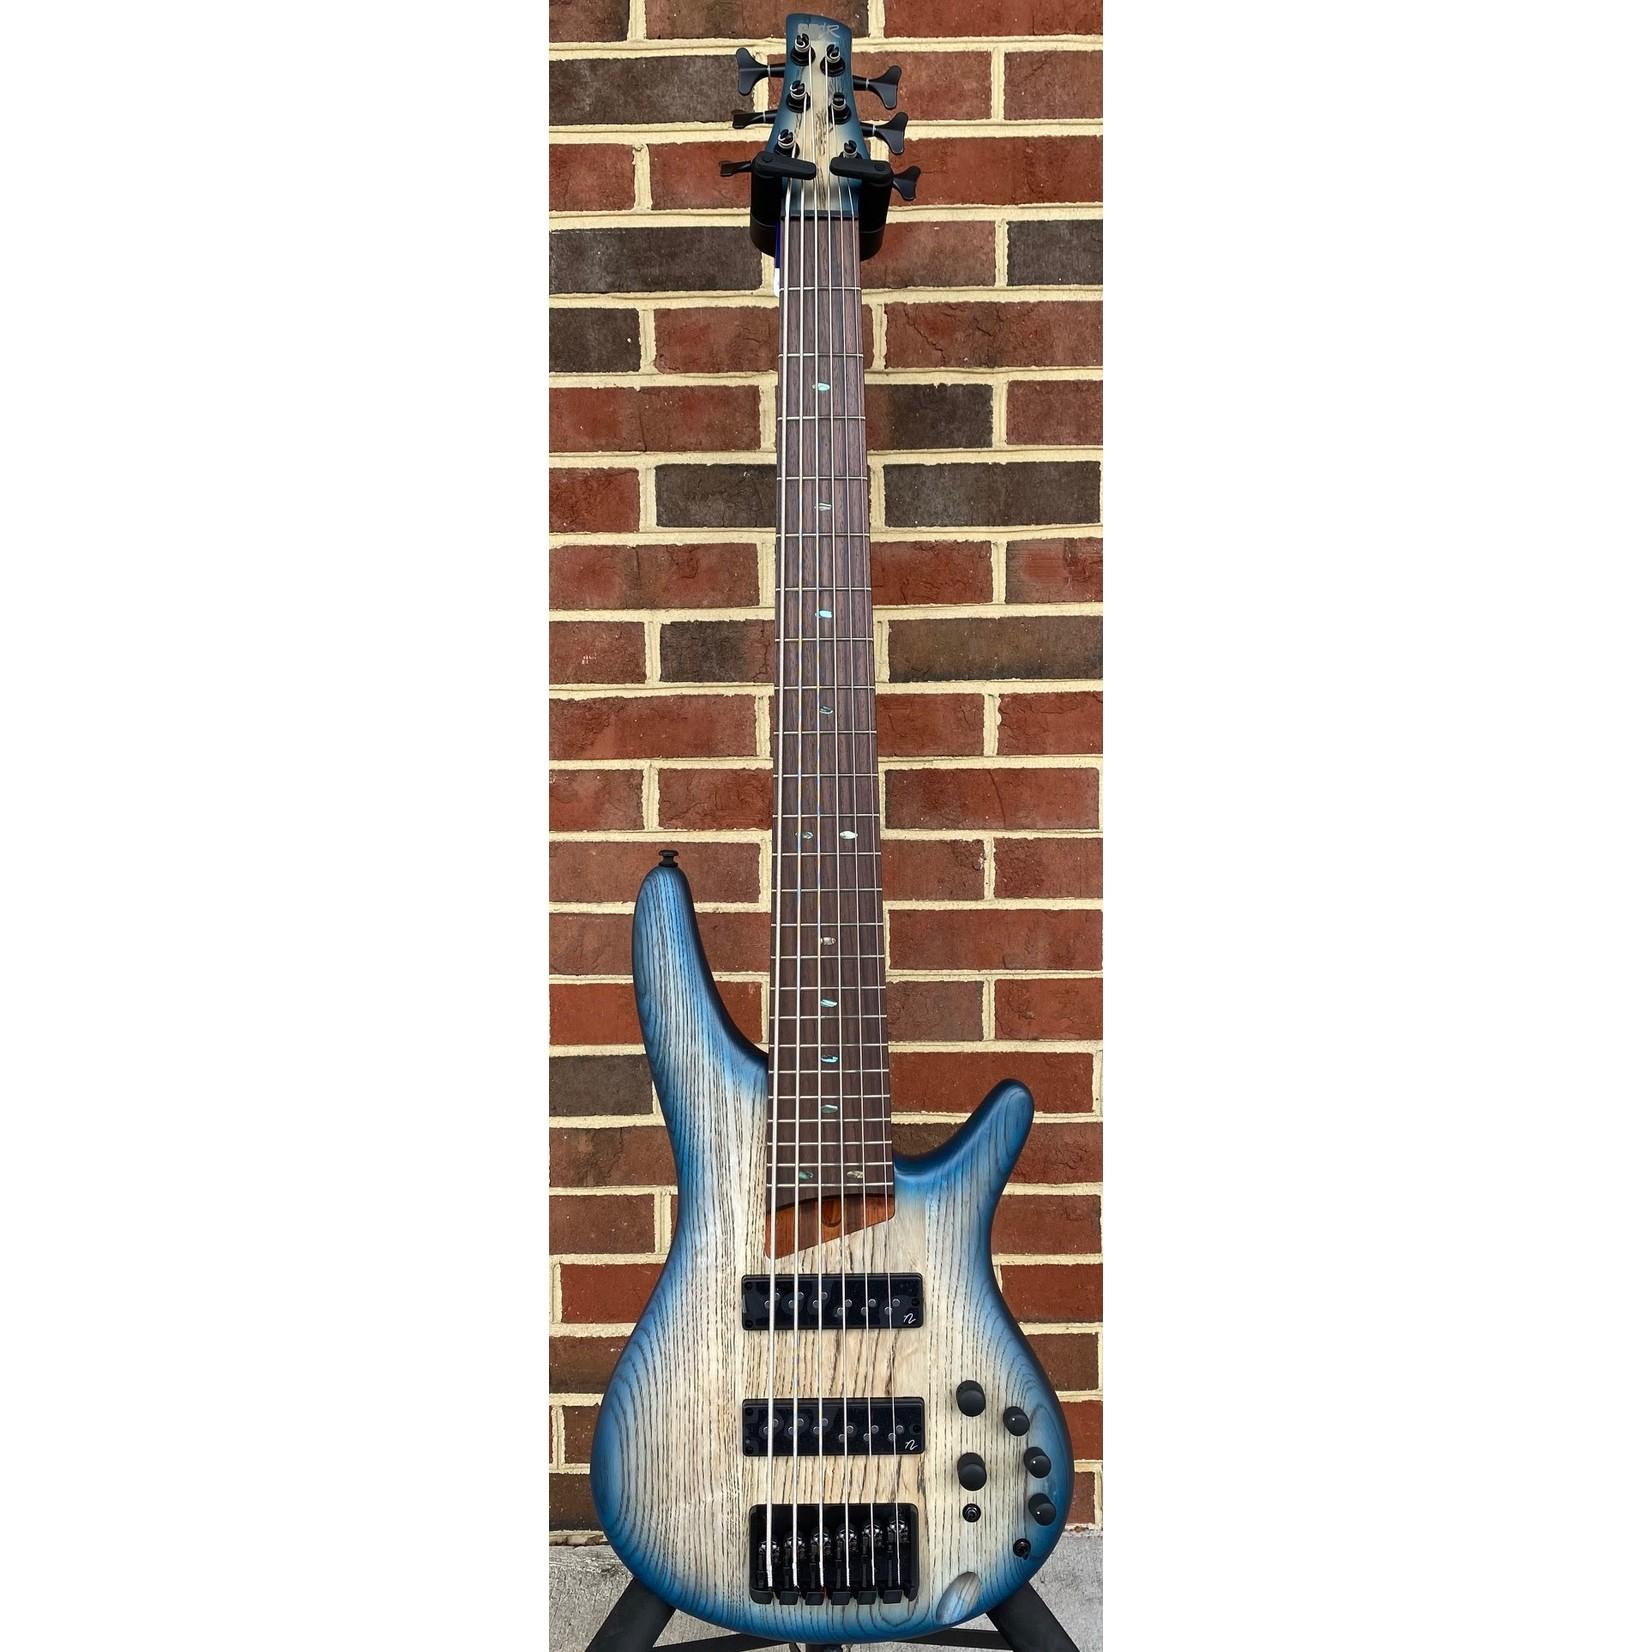 Ibanez Ibanez SR606ECTF, 6-String Bass, Cosmic Blue Starburst Flat, Nordstrand Pickups, Ash Body